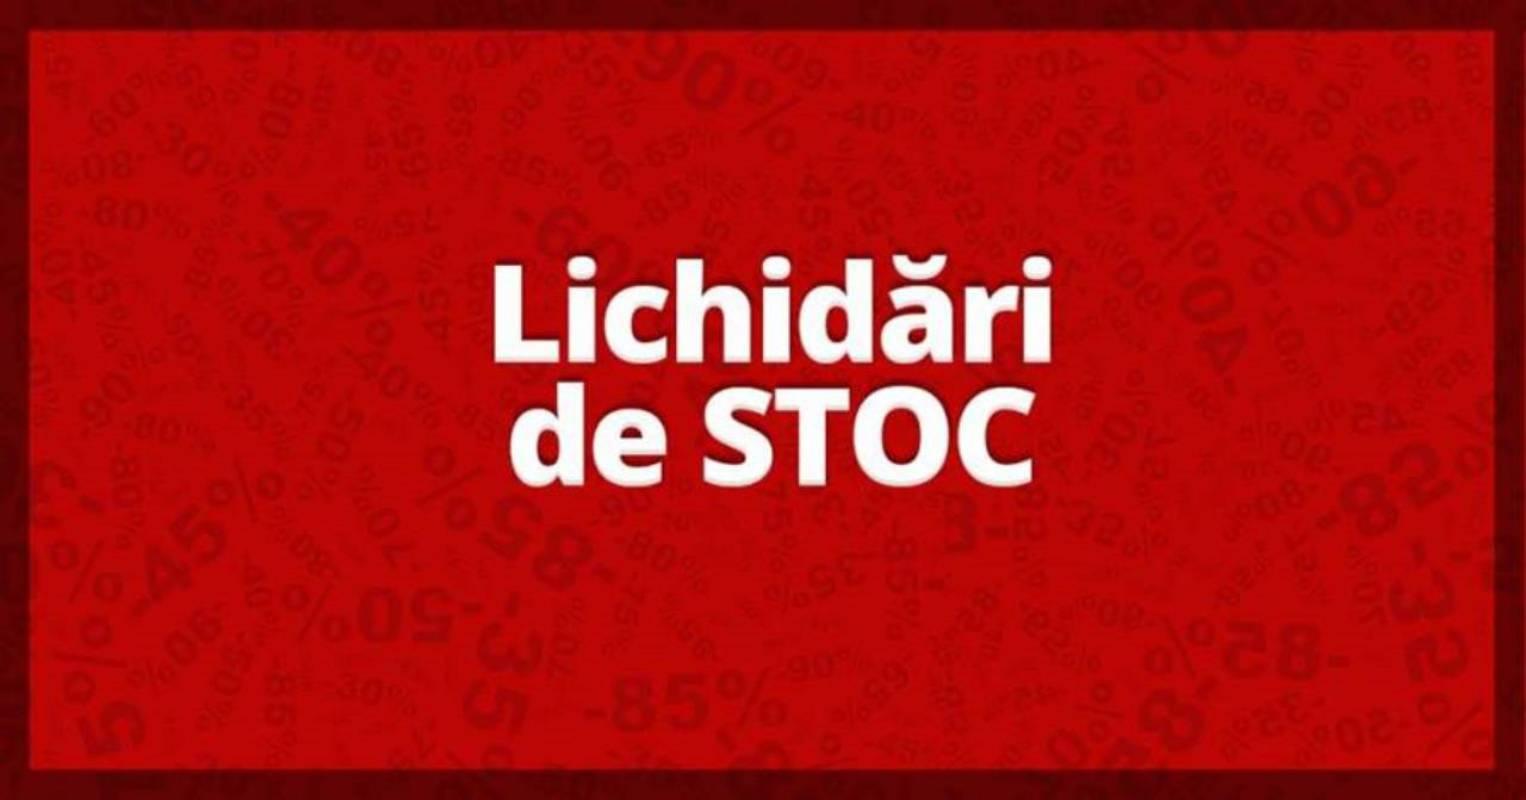 eMAG 2 LEI LICHIDARI